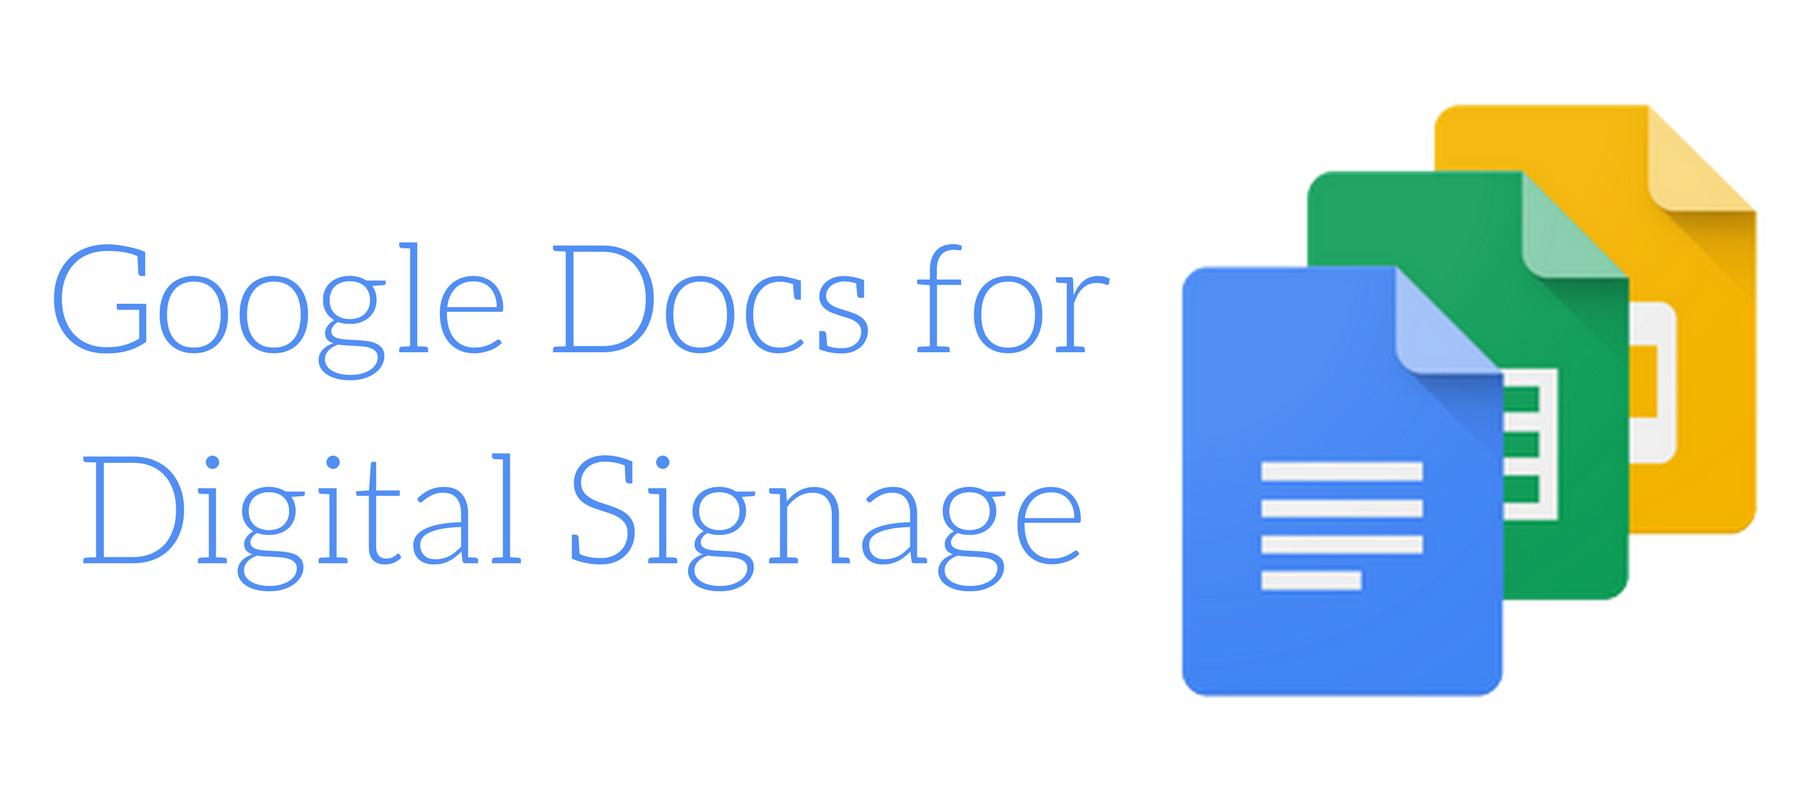 Google Docs for Digital Signaged heading1-1